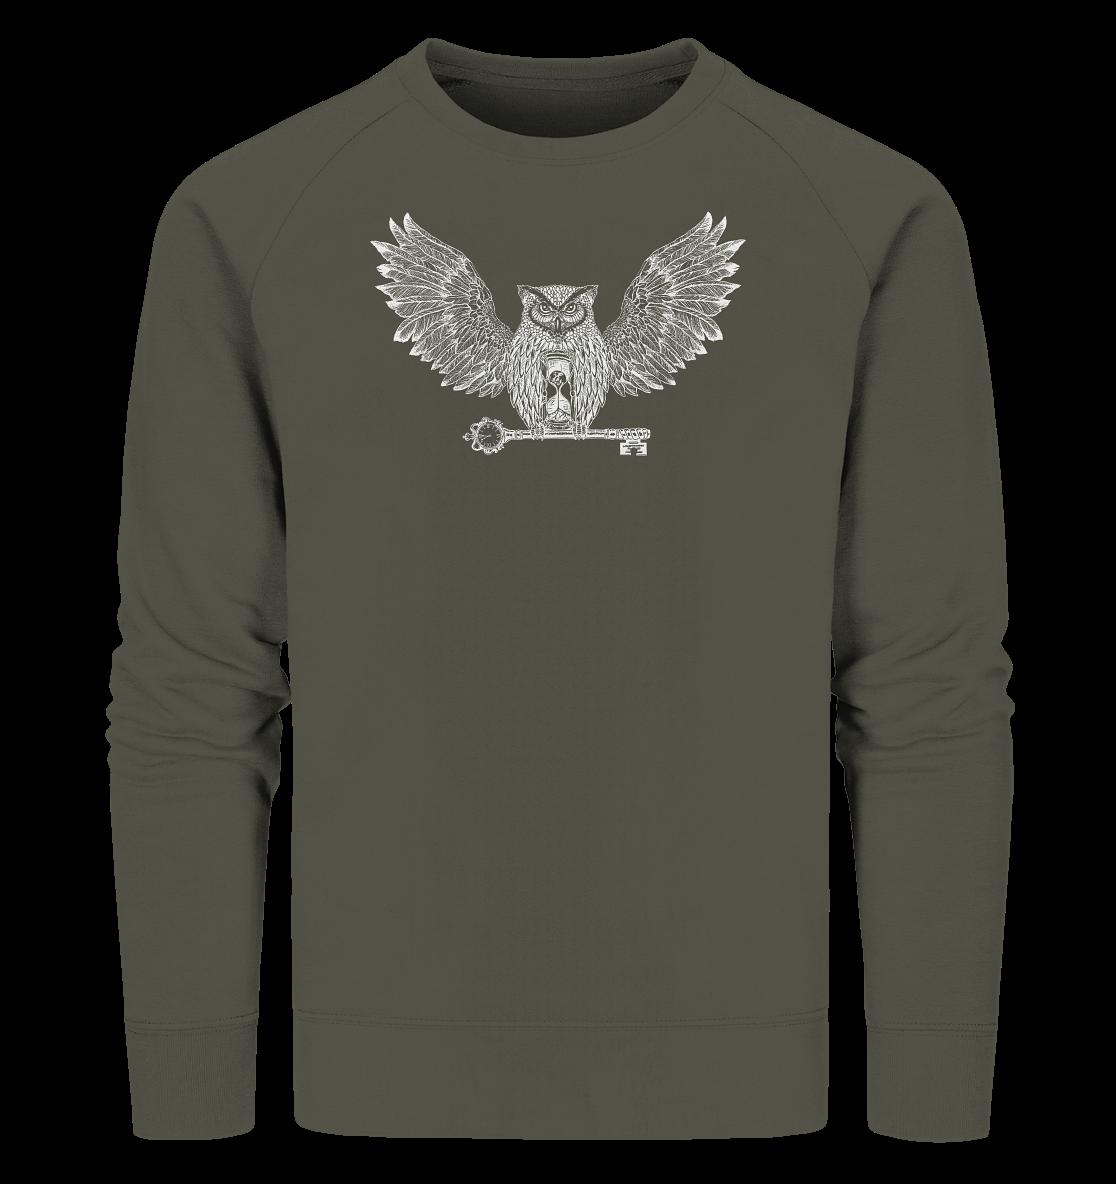 front-organic-sweatshirt-545348-1116x-3.png